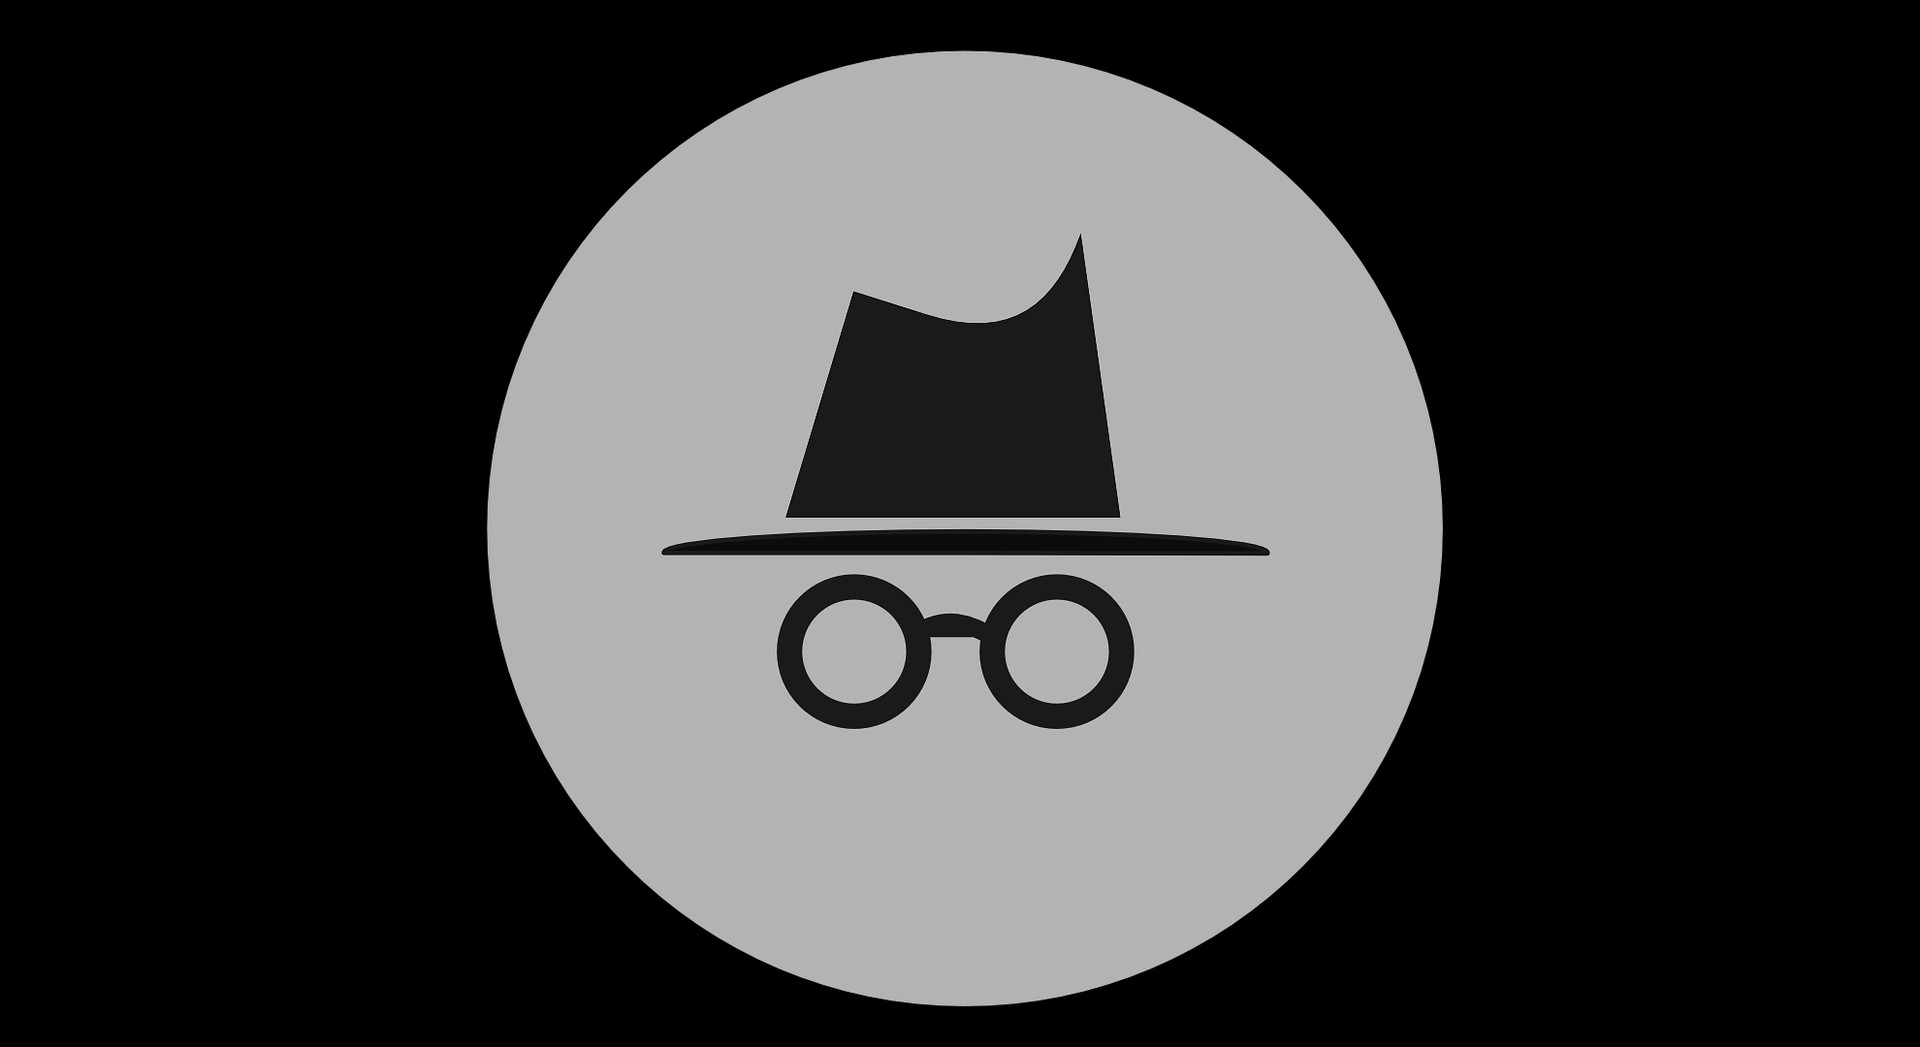 Modul incognito nu te face atât de anonim pe internet